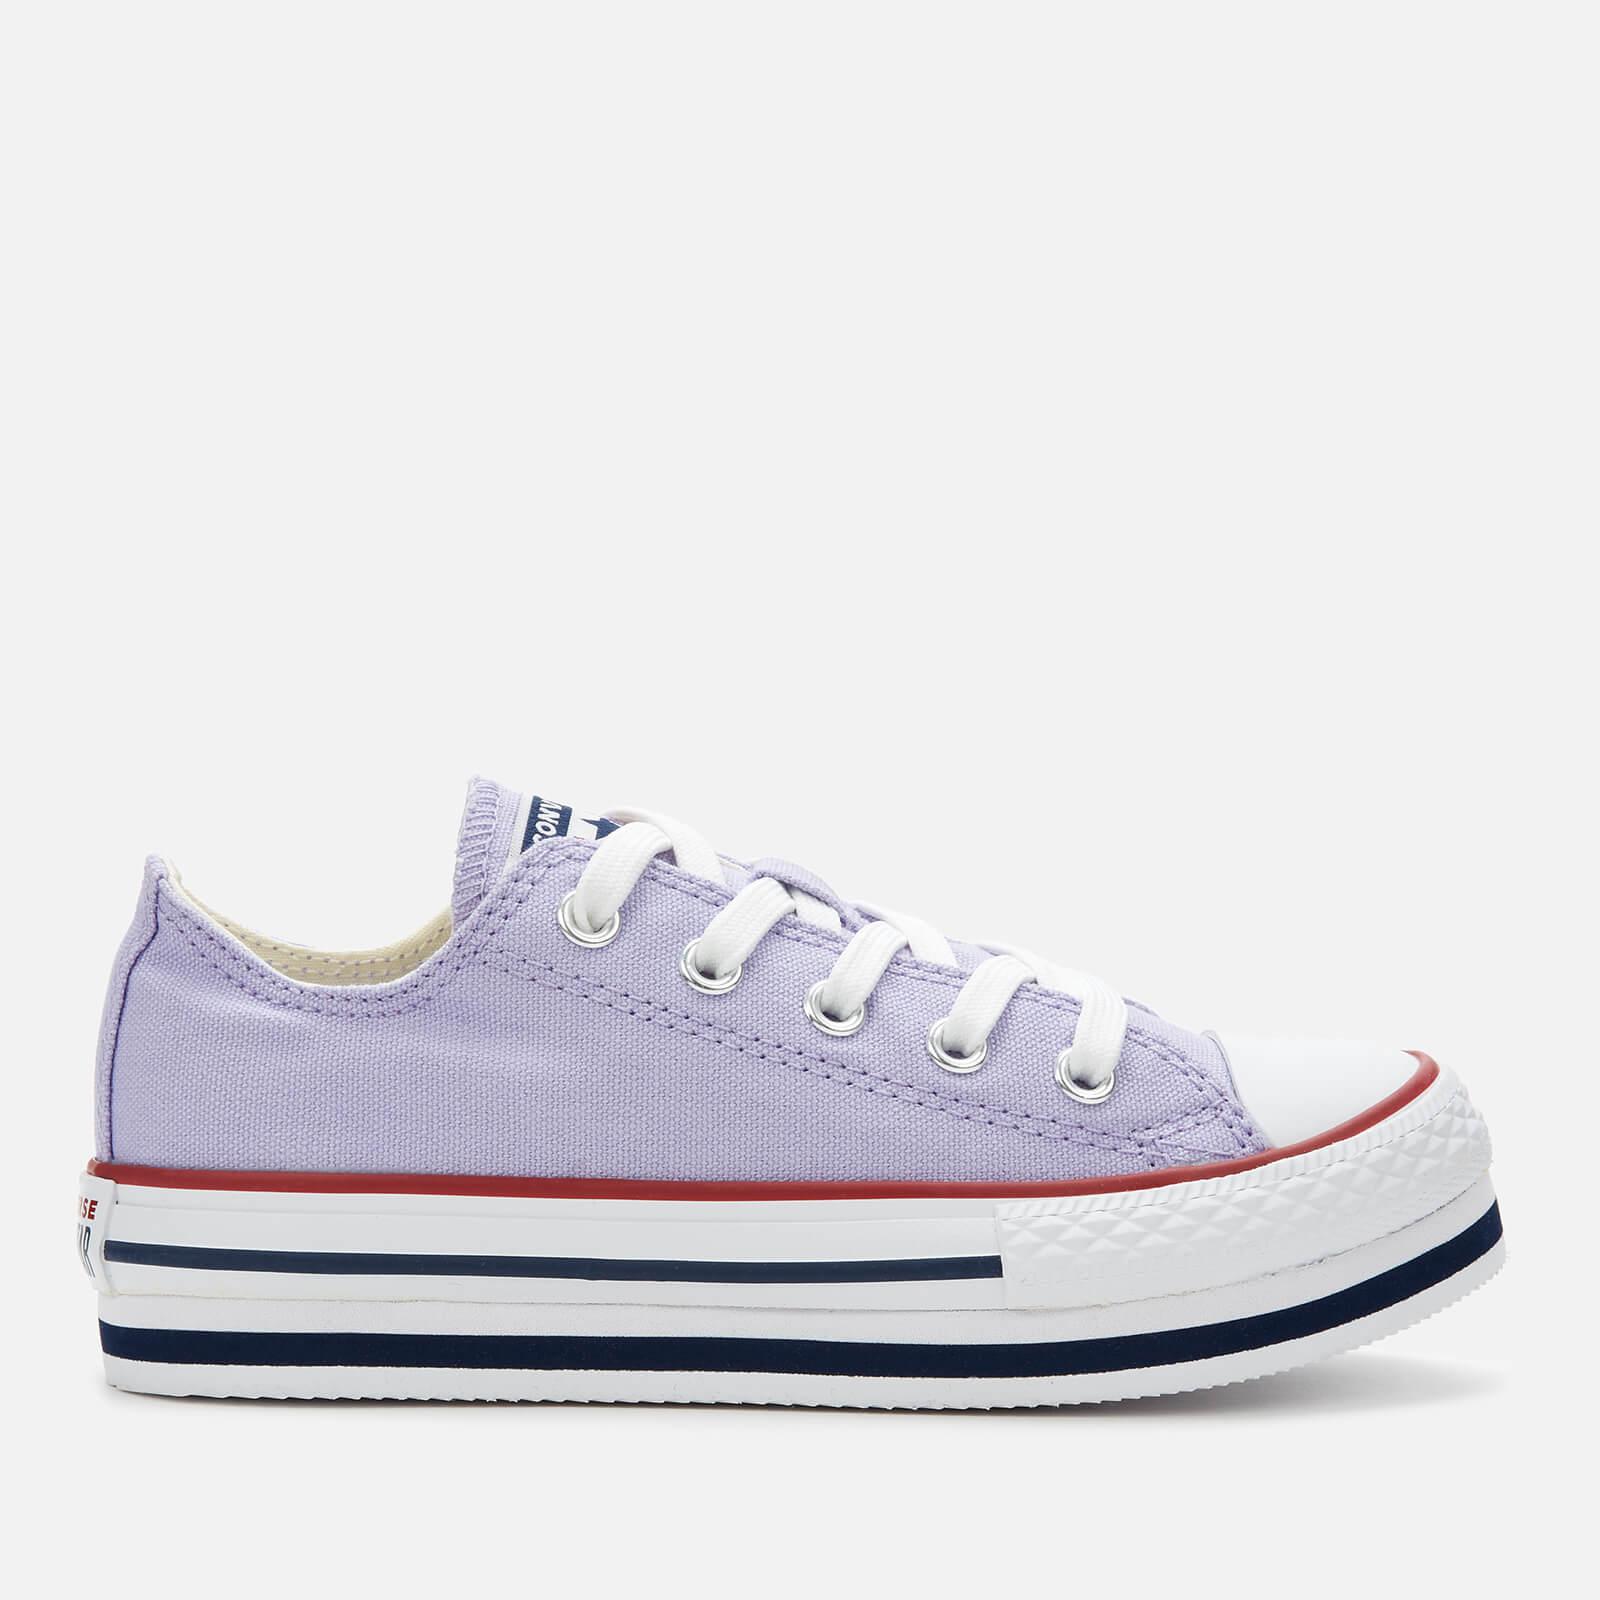 Converse Chuck Taylor All Star Ox Navy Garnet White   Footshop